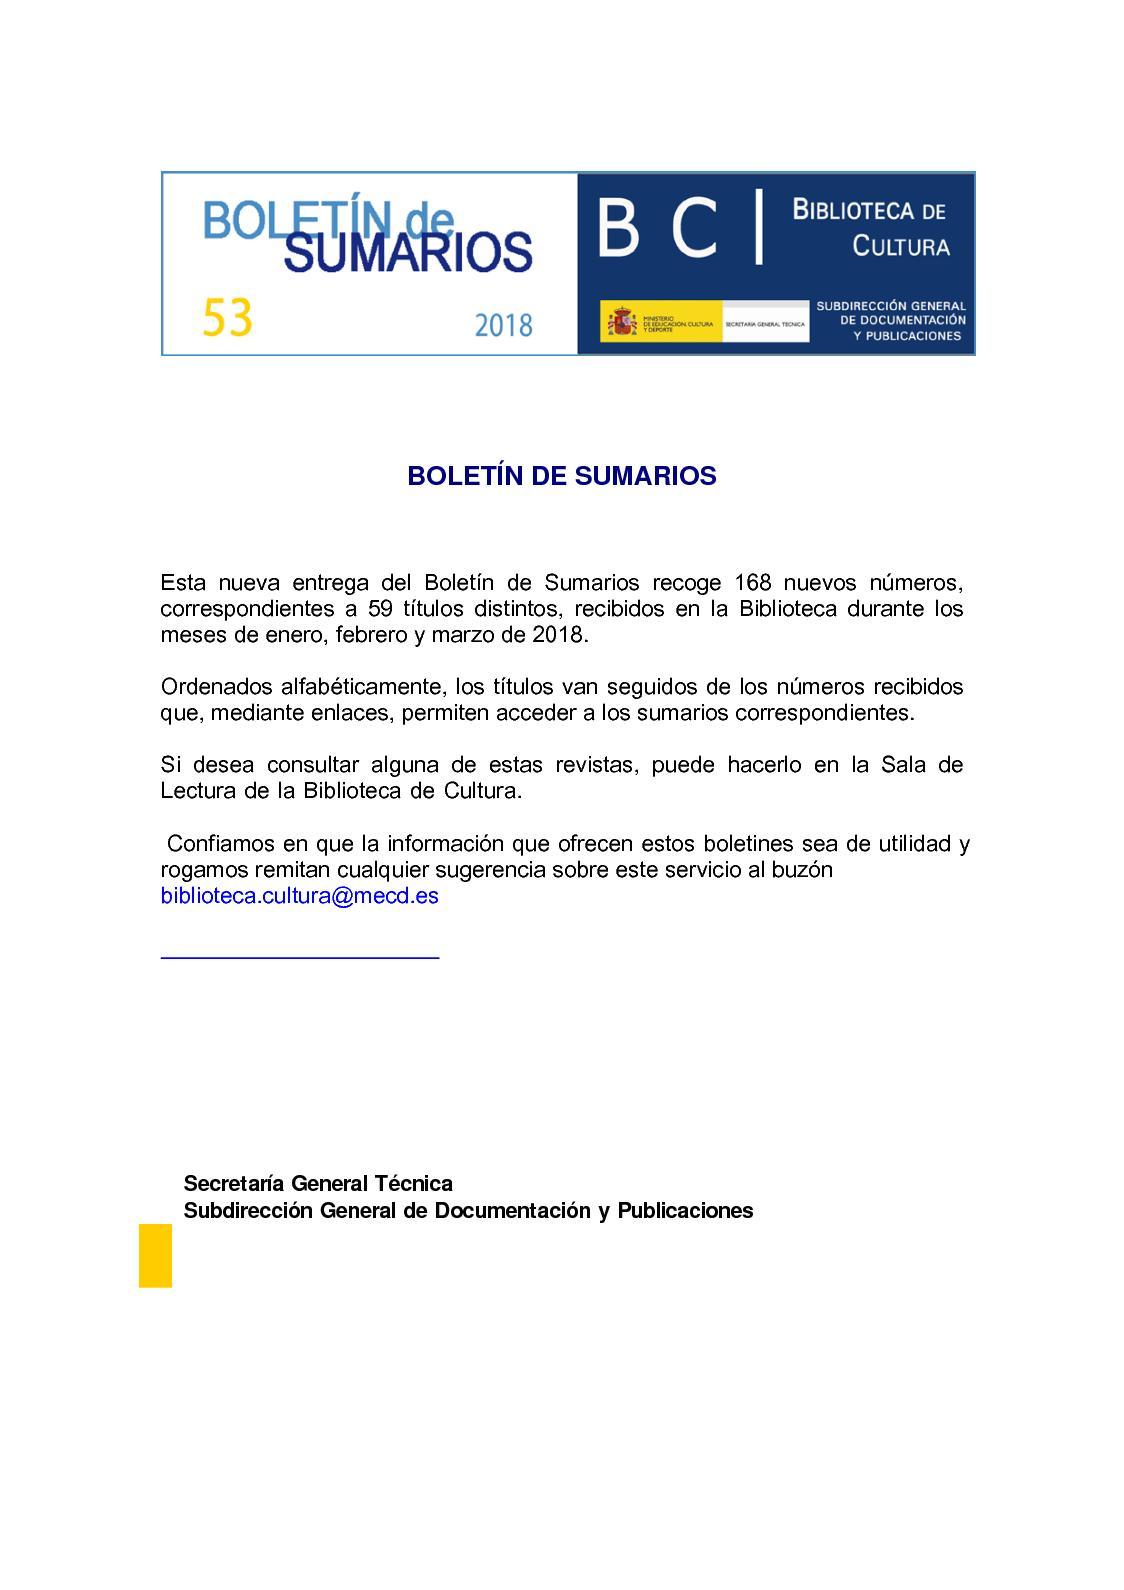 Calaméo - Boletin de Sumarios de la Biblioteca de Cultura 53